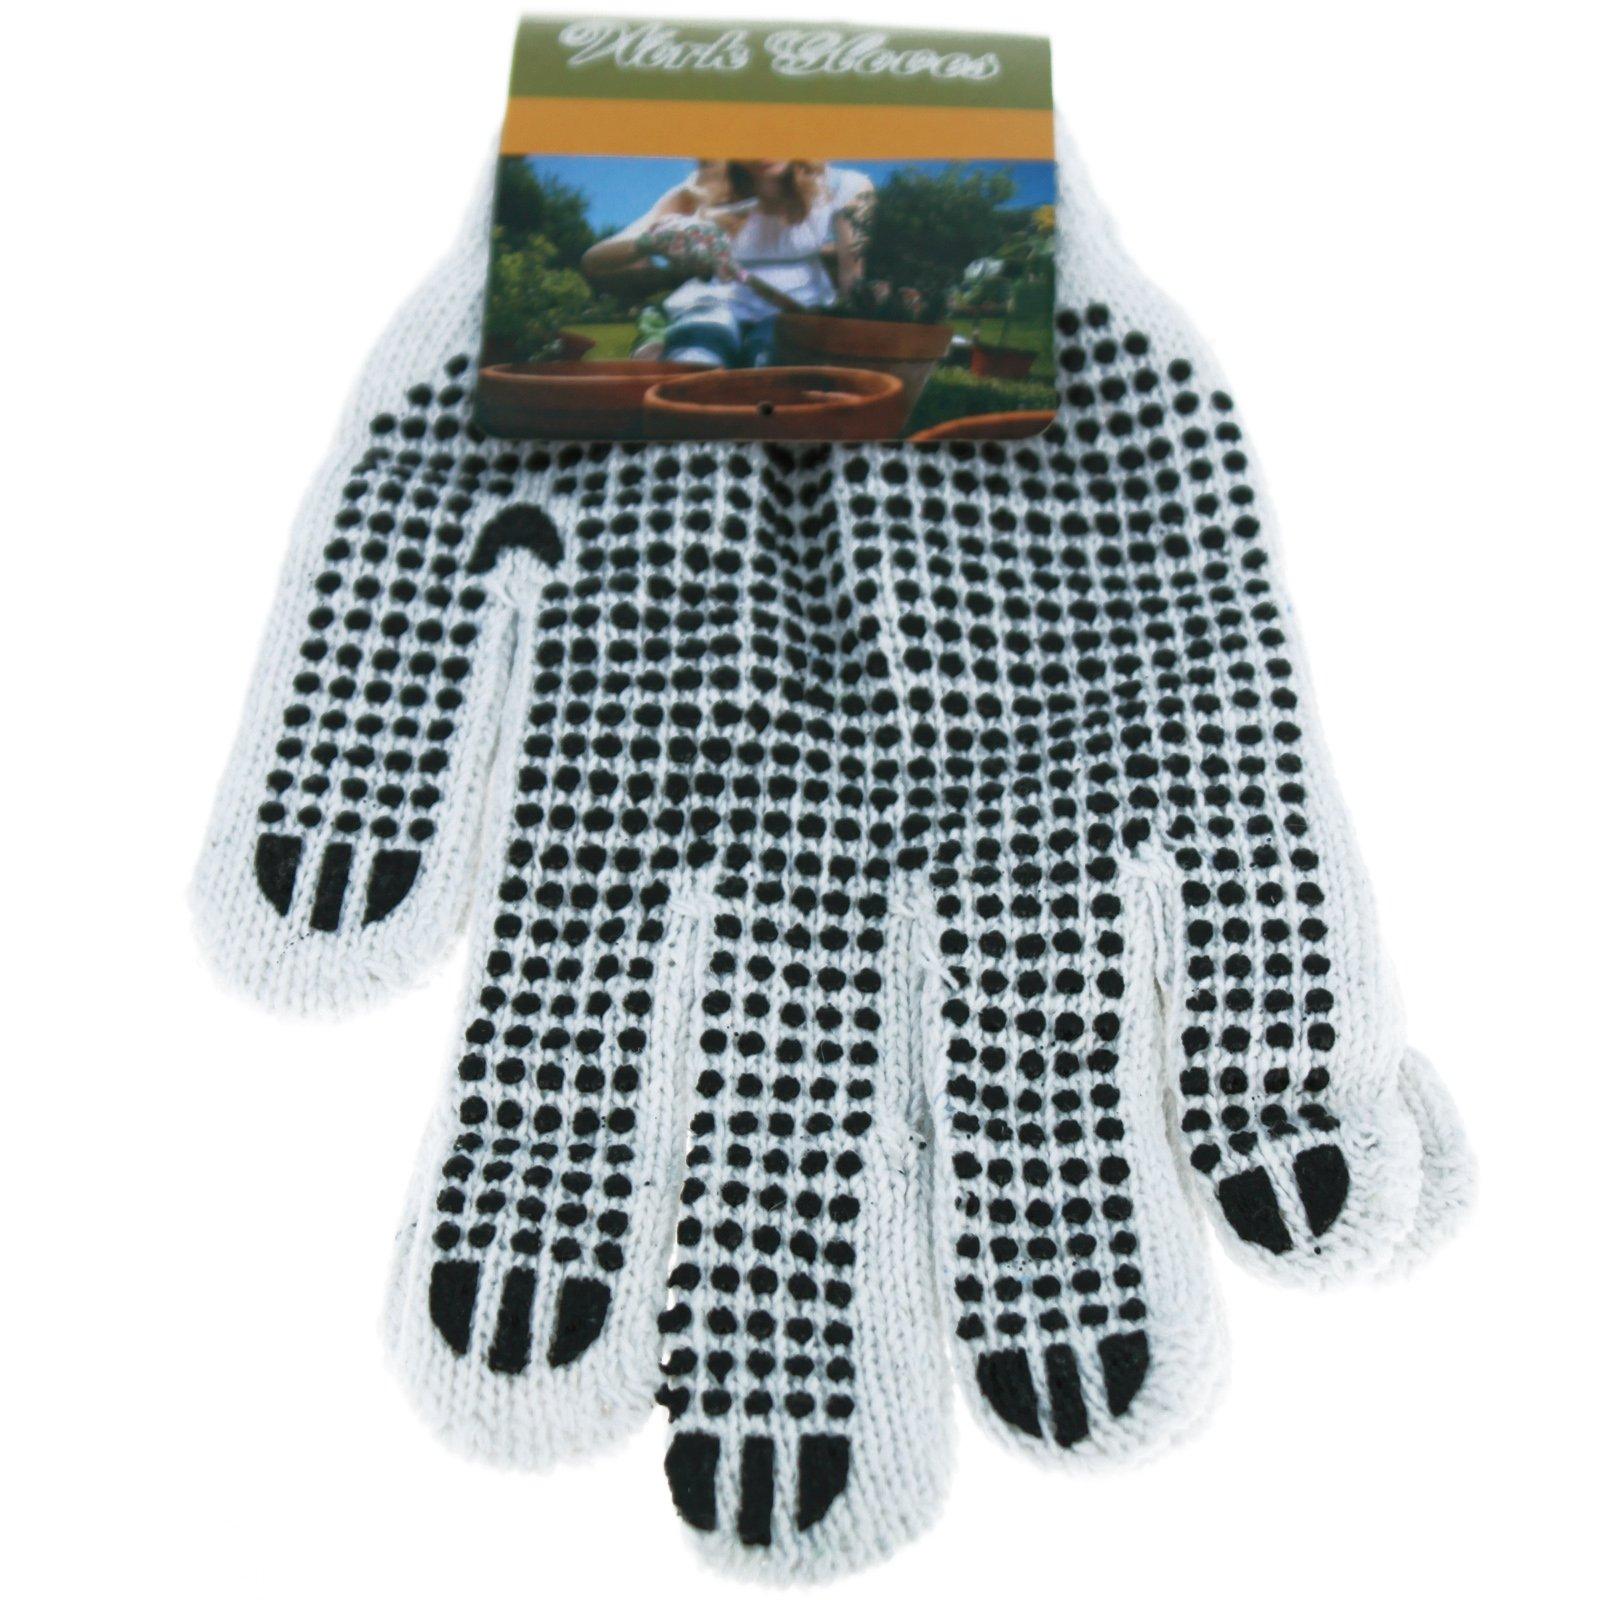 Universal - Dot Grip Non-Slip Gardening Work Gloves - Black